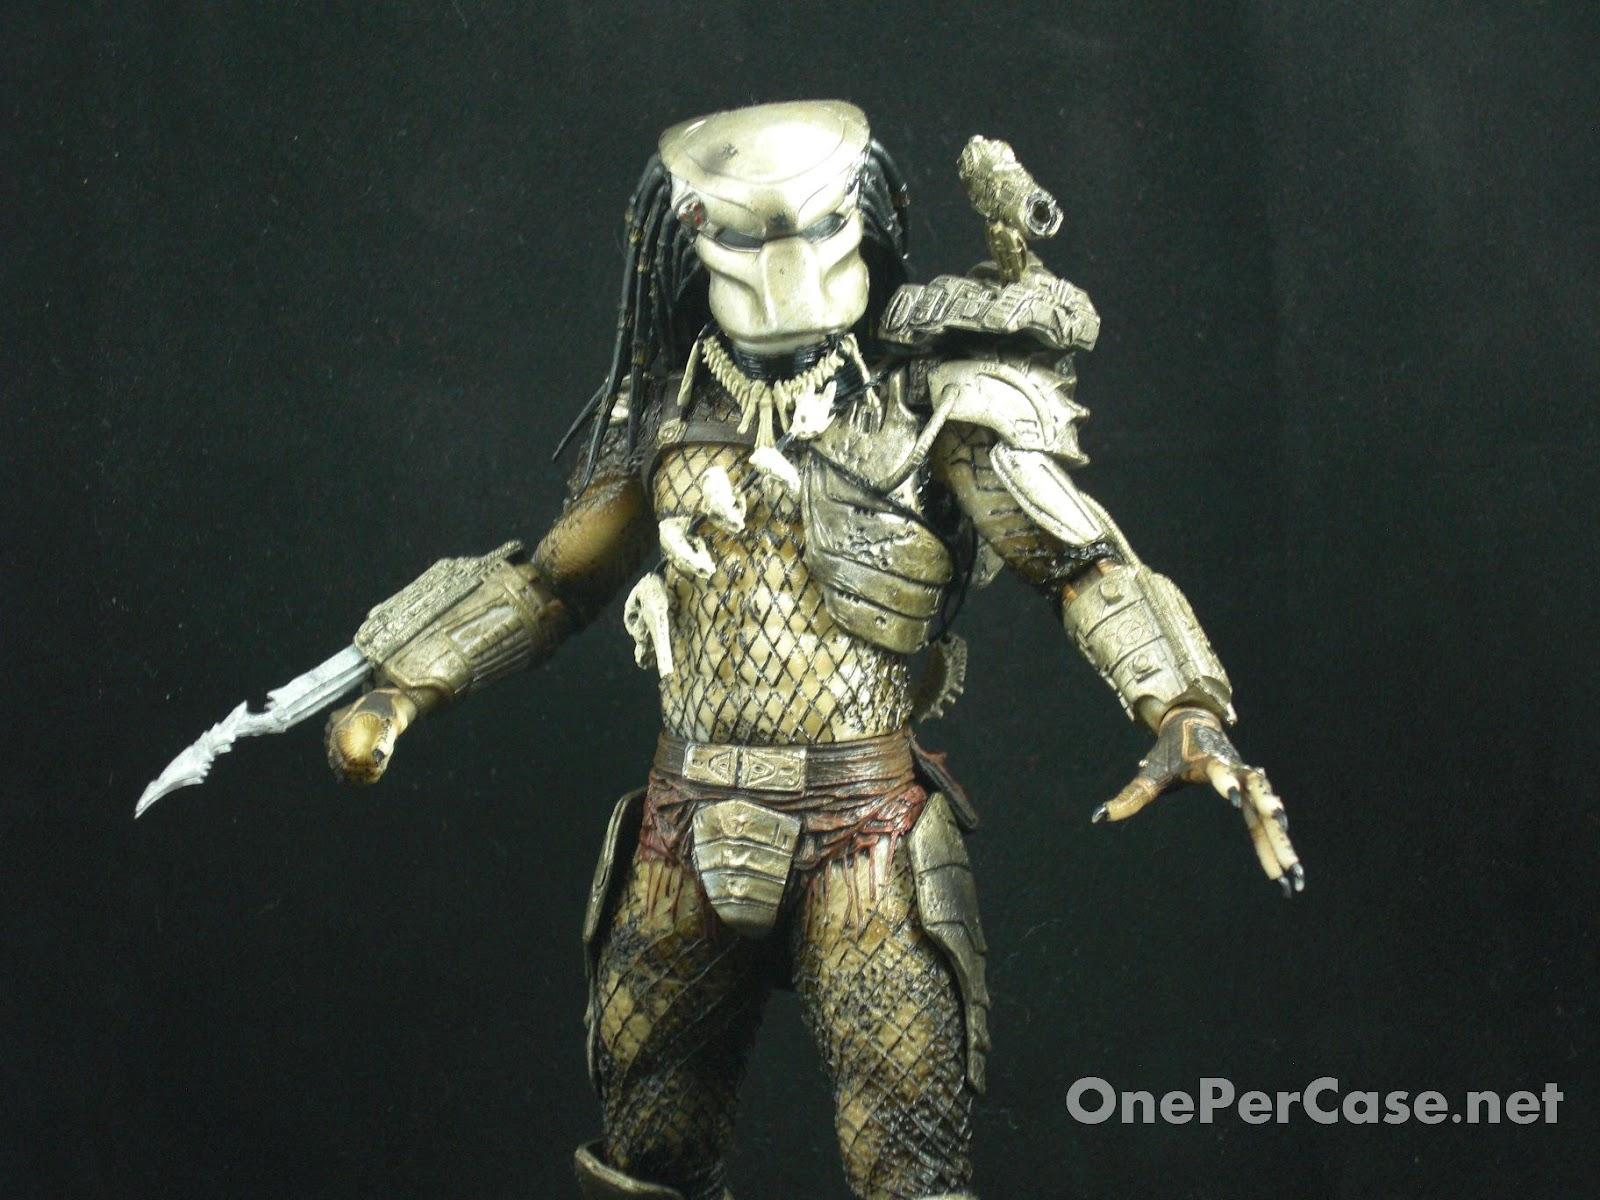 Predator Toys R Us : One per case cloaked classic predator neca toys r us